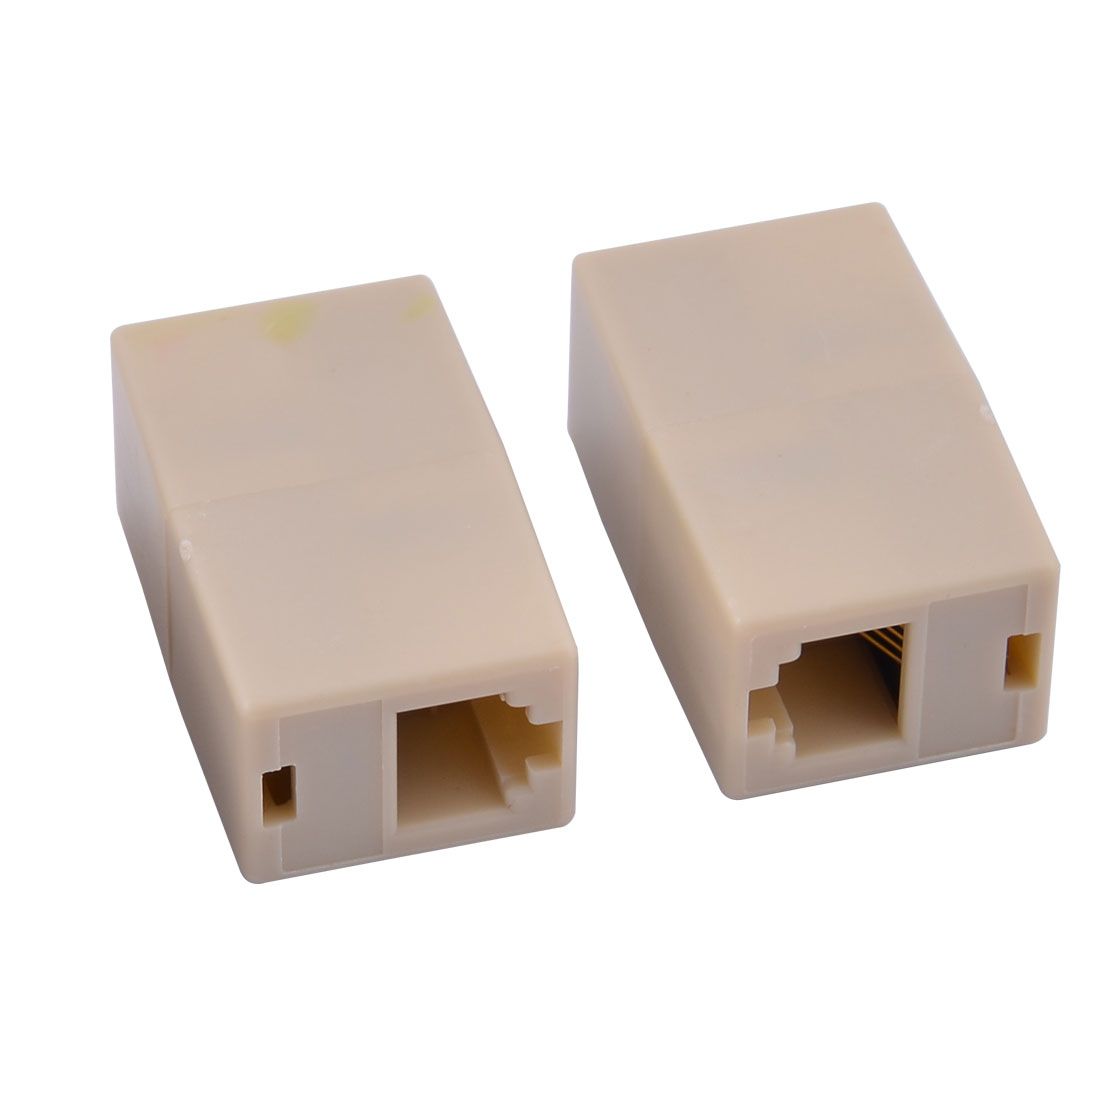 3pcs RJ45 8P8C Female to 2 Female Coupler Enternet Adapter Beige